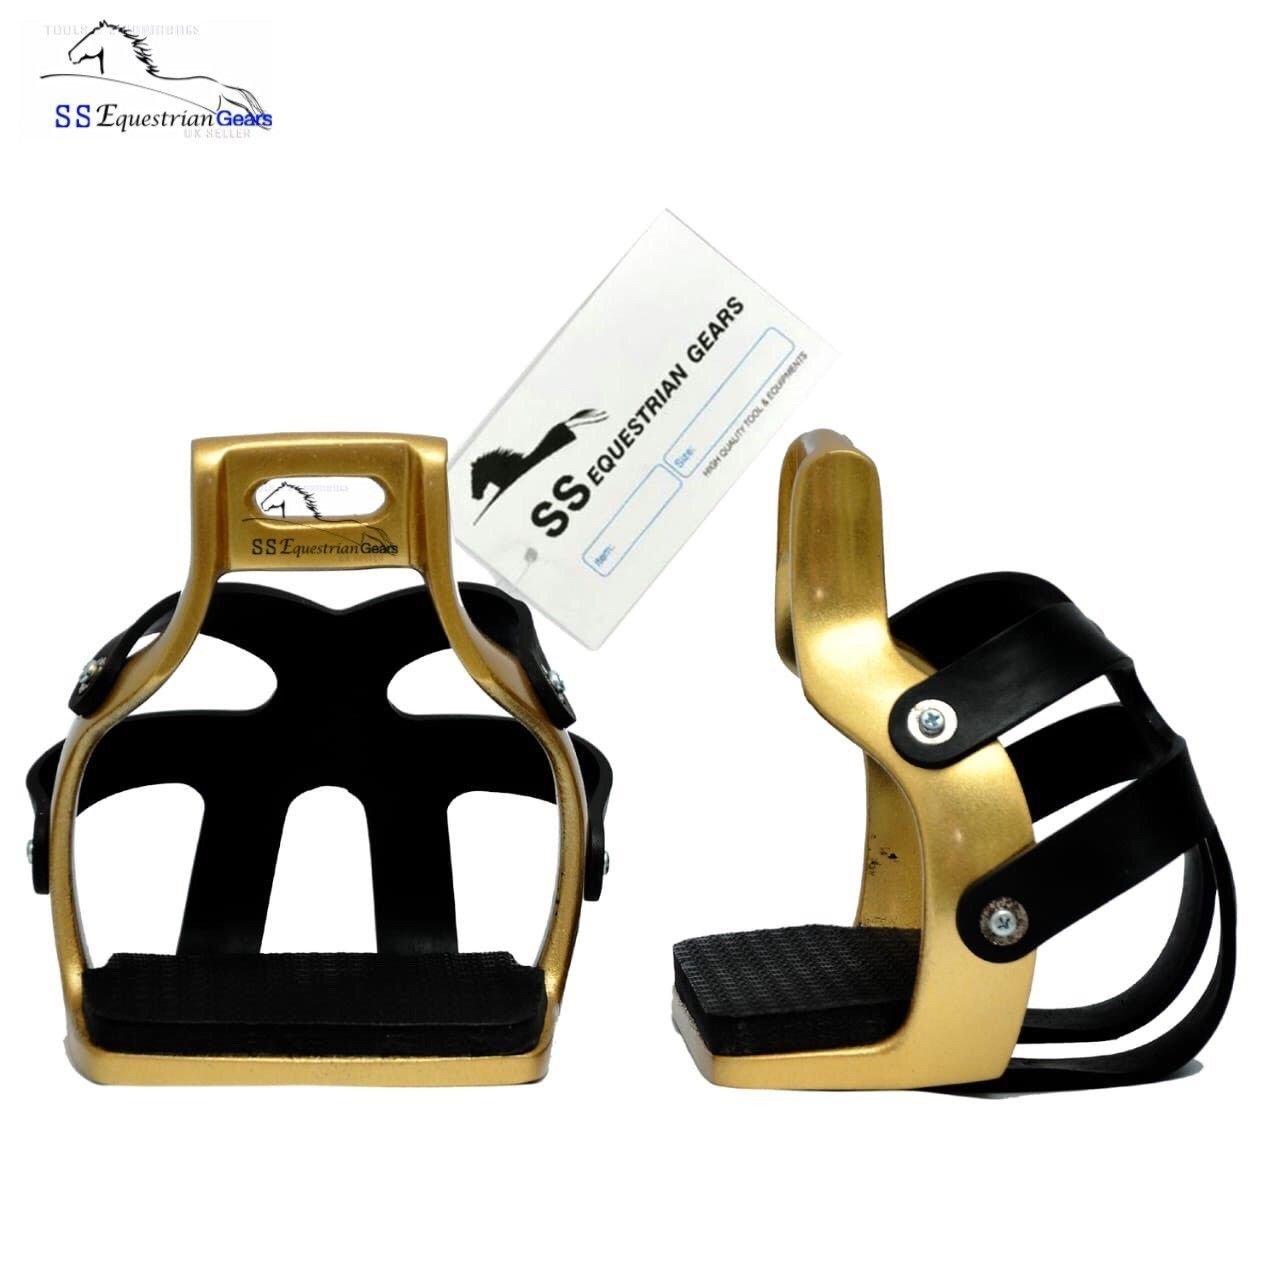 SSEG Aluminium-Endurance Käfig Käfig Käfig für stirrups-equestrian-horse riding-horse Stirrups 4d50e0